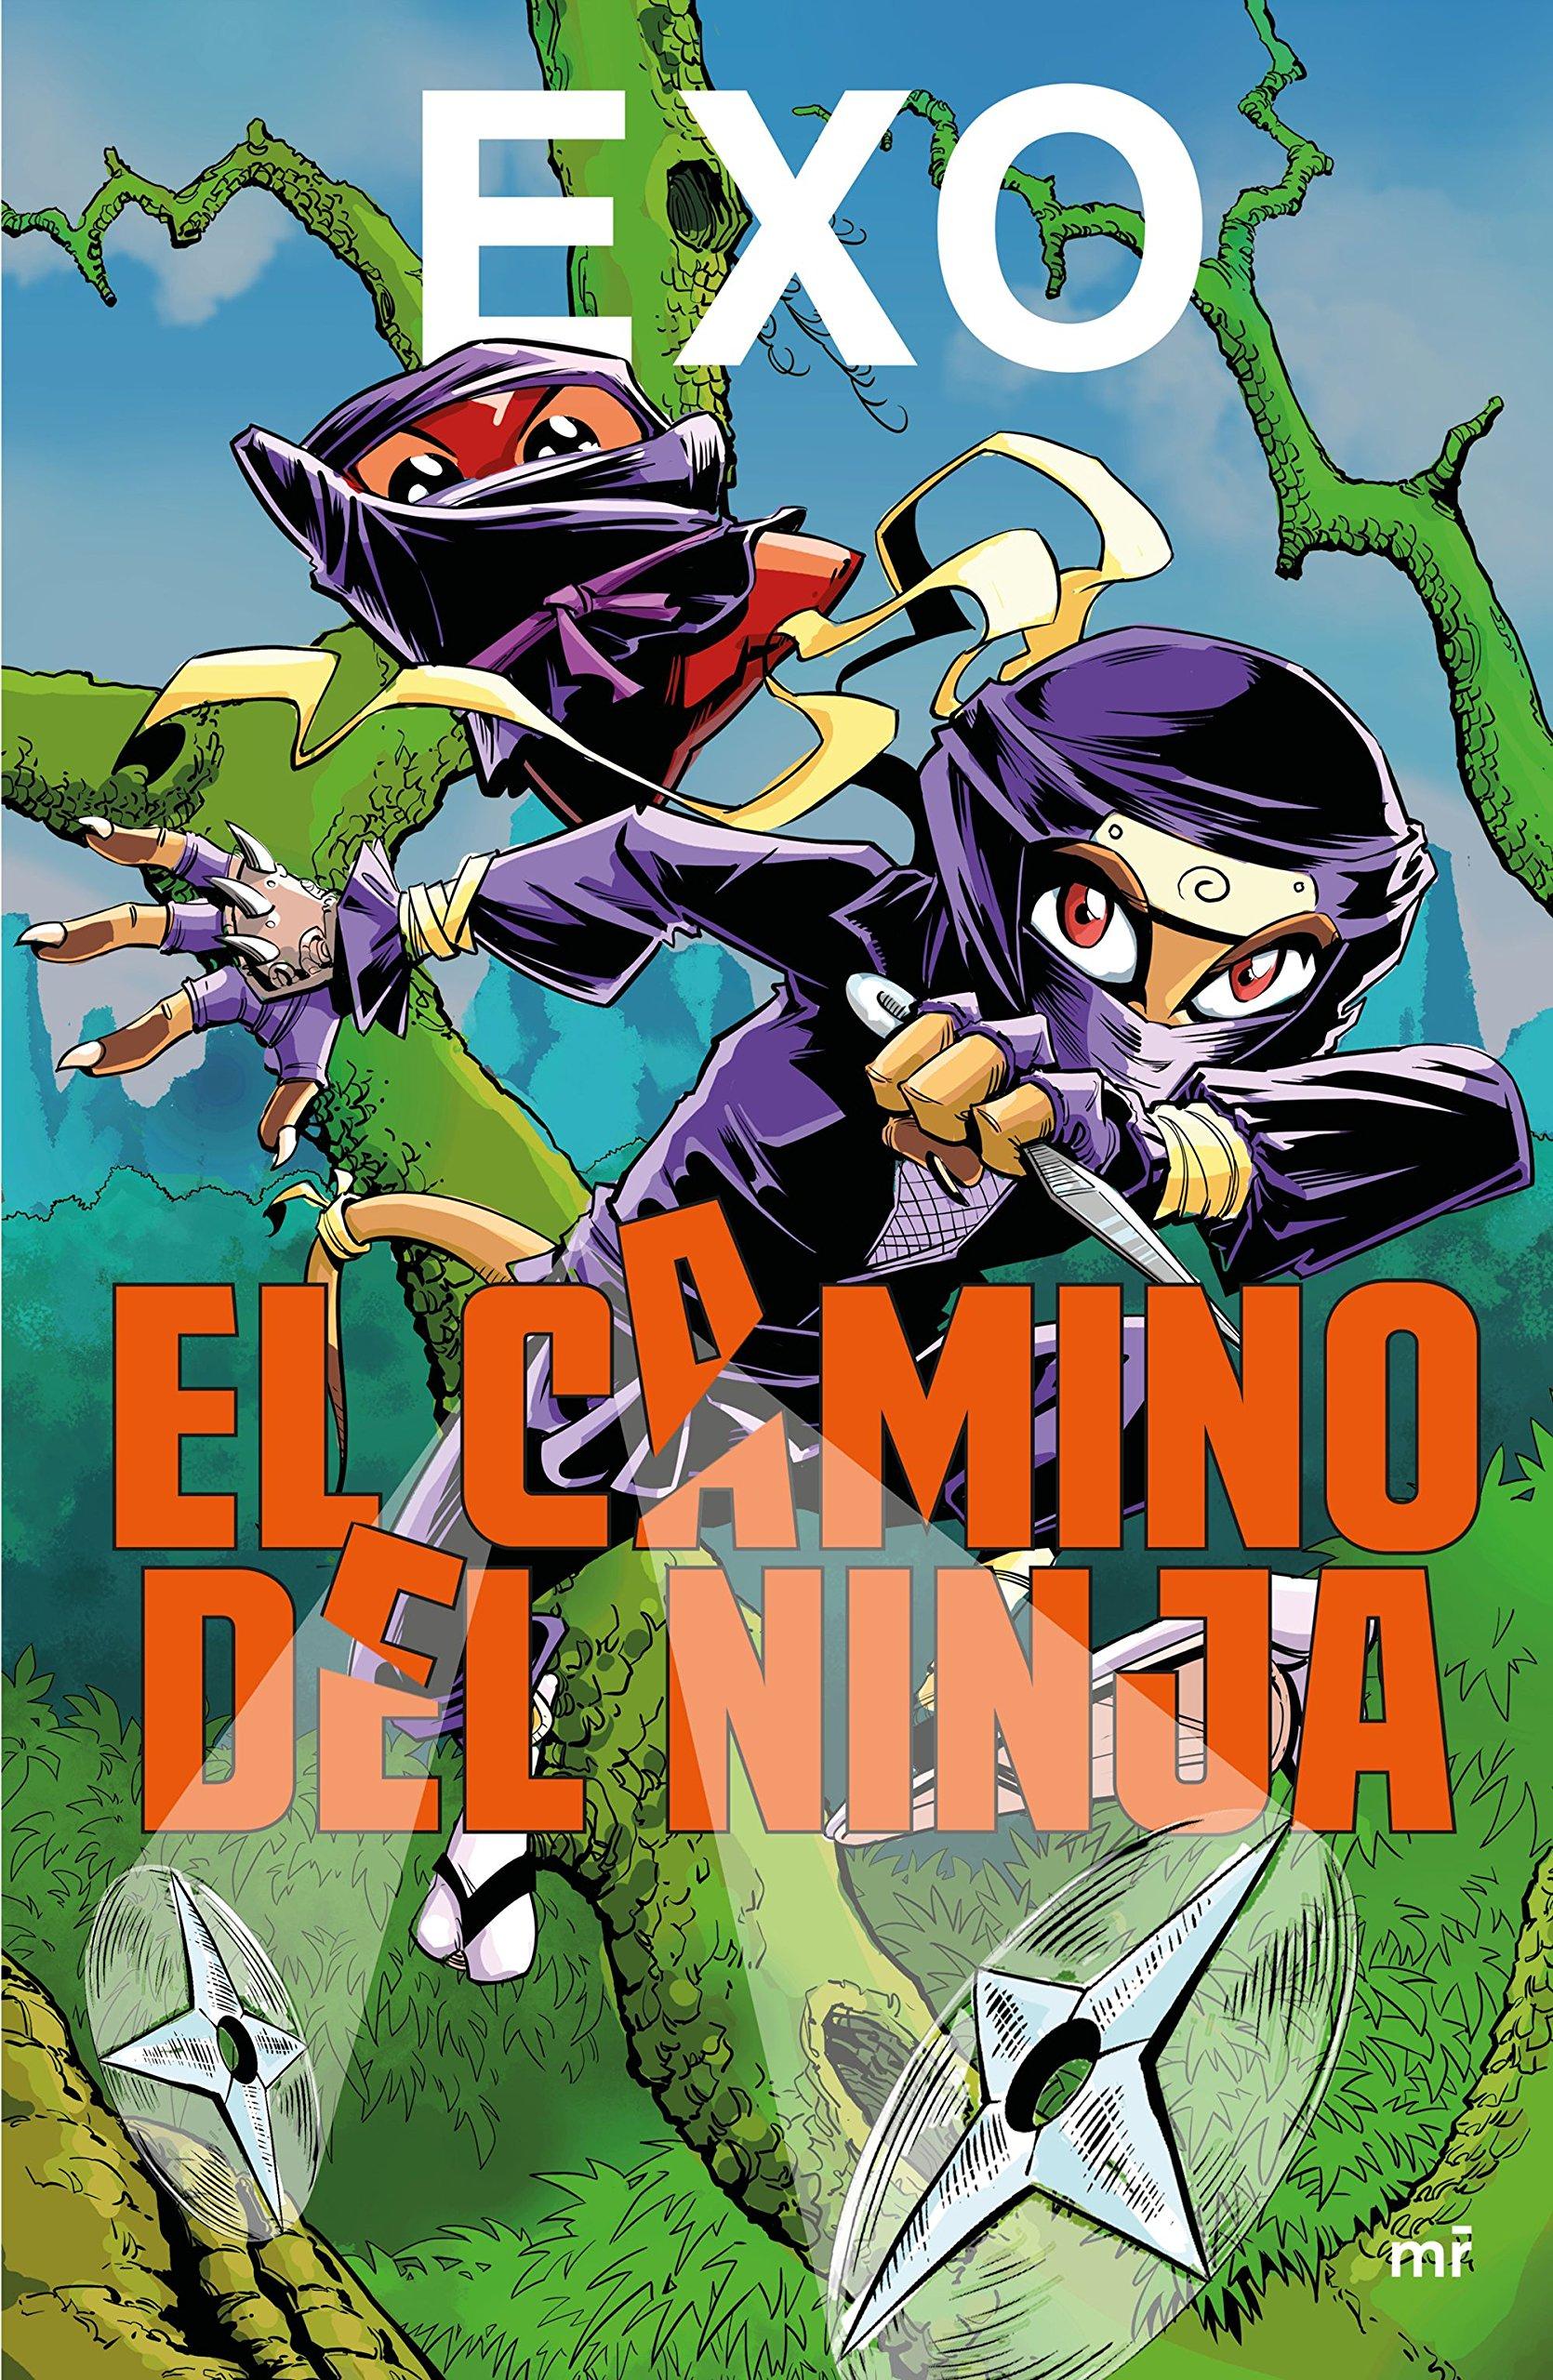 El camino del ninja: Exo: 9788427043381: Amazon.com: Books